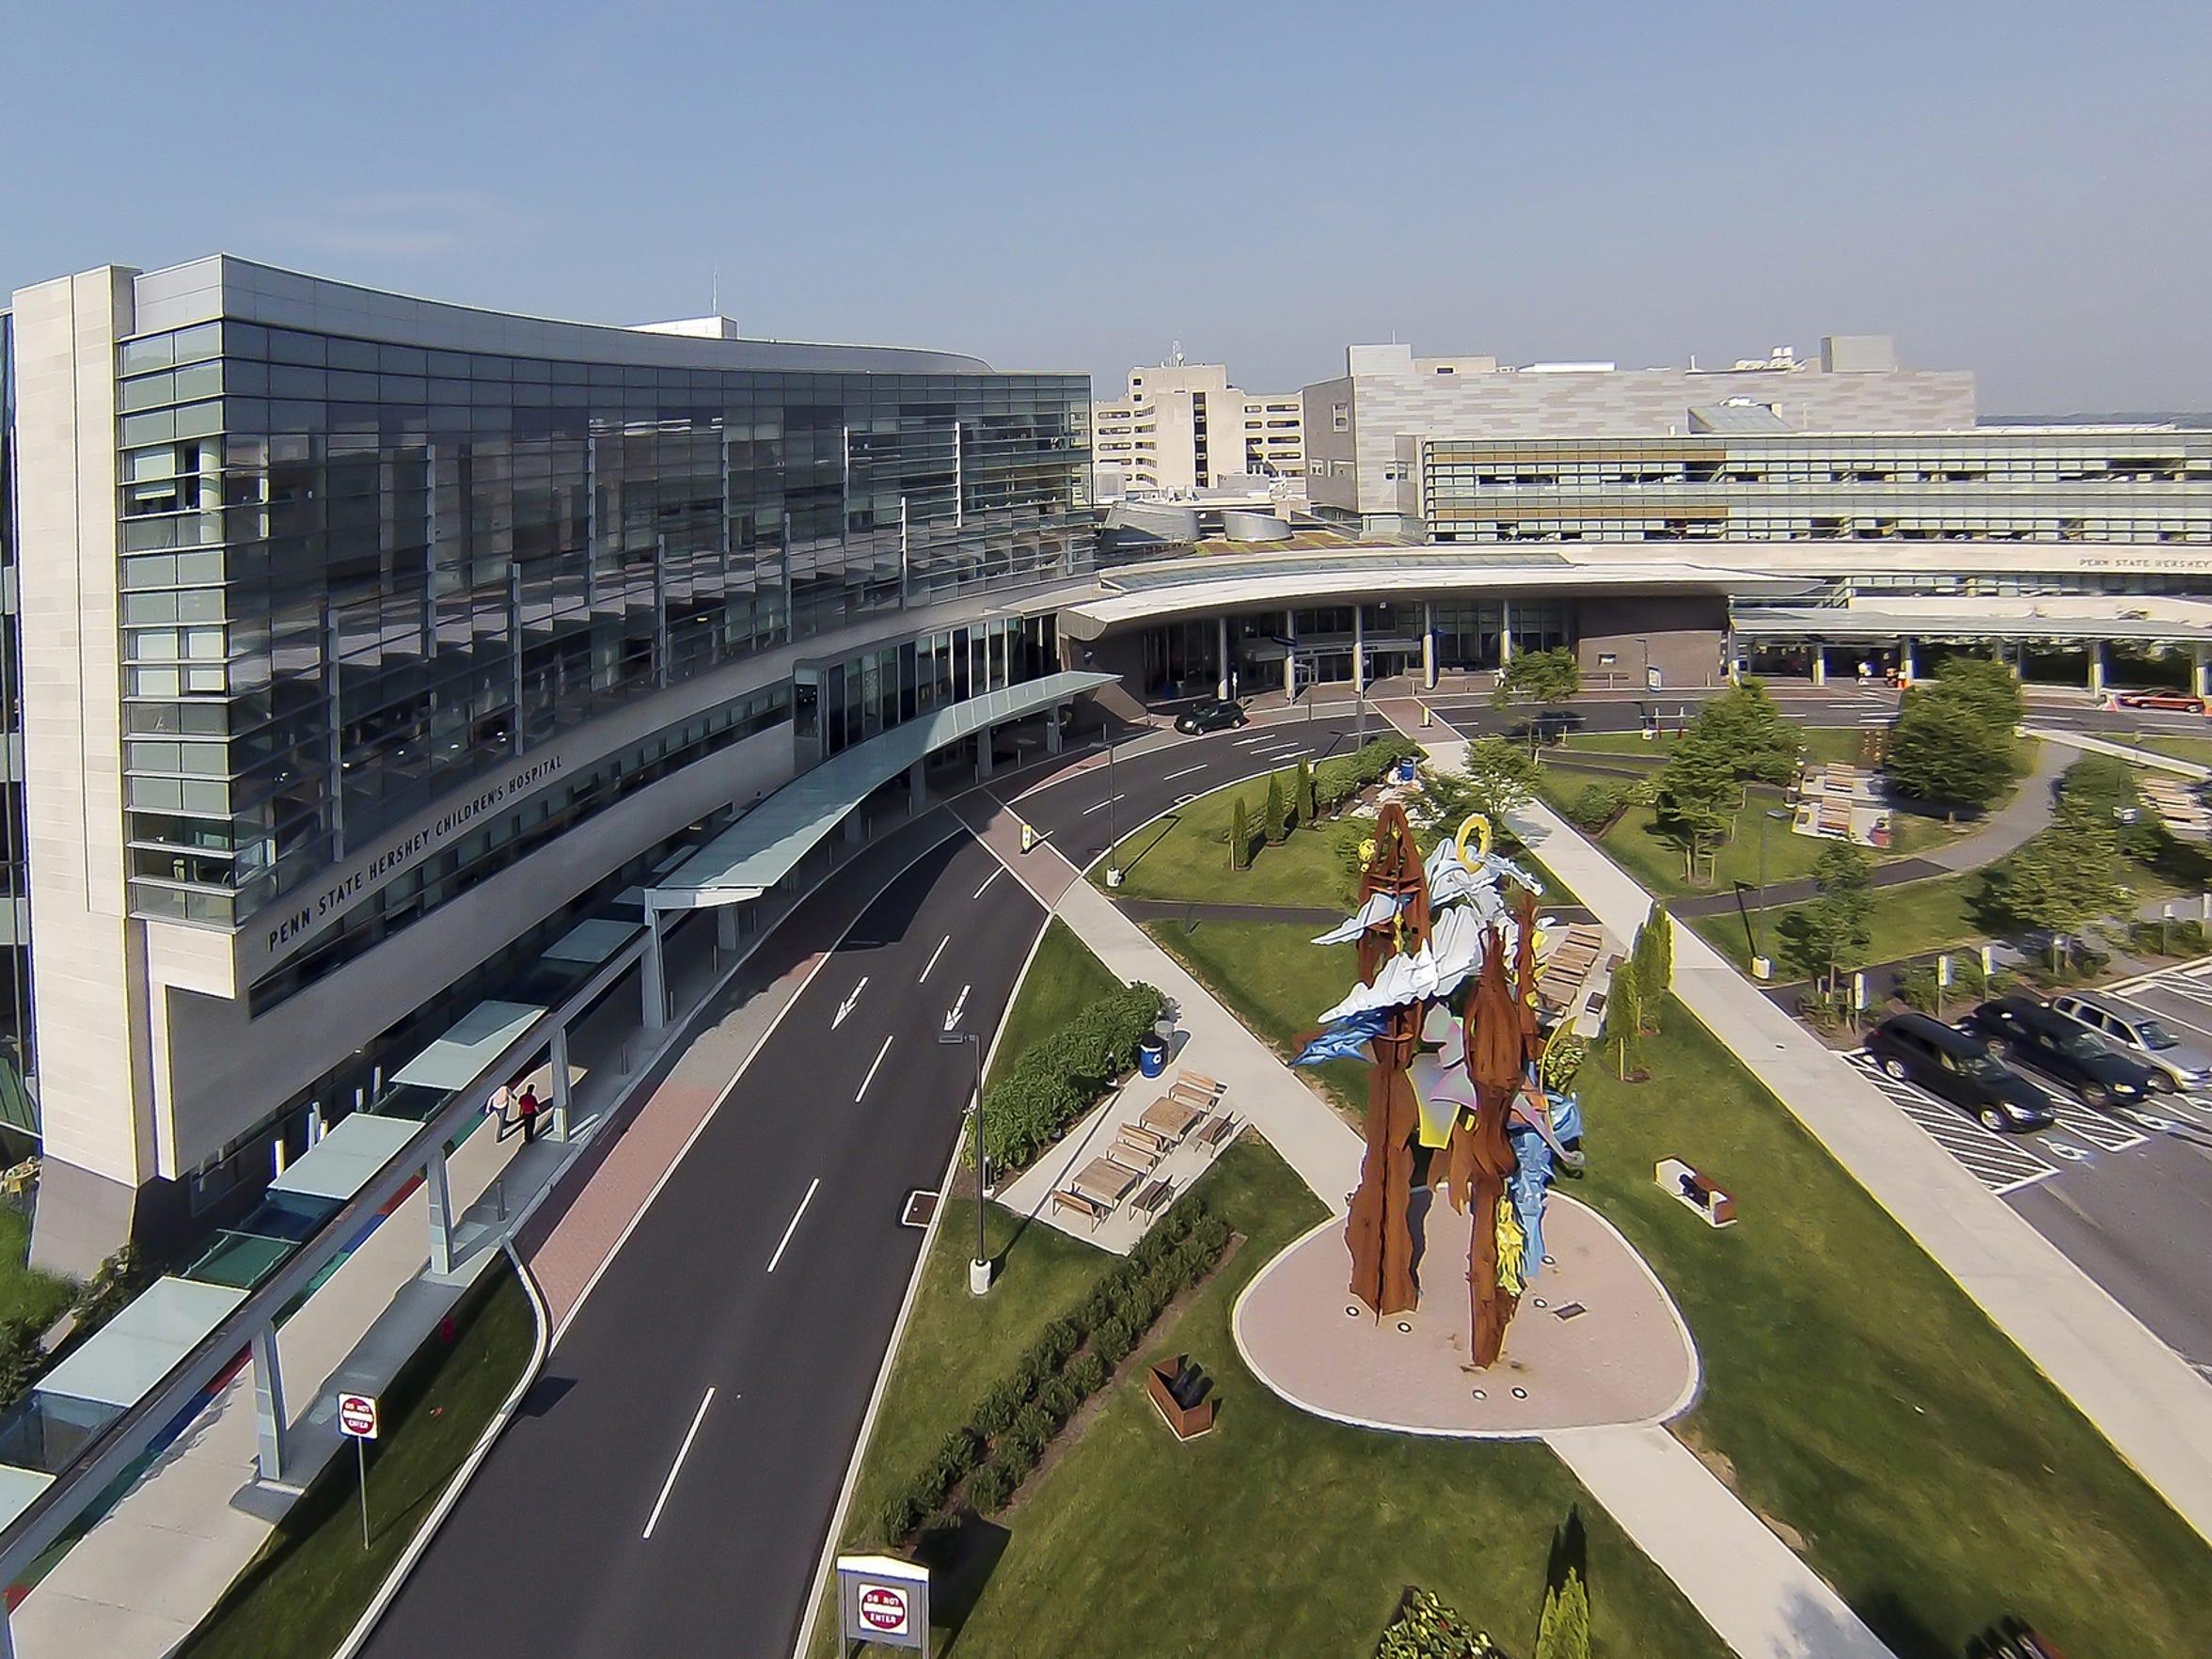 The Penn State Hershey Medical Center.